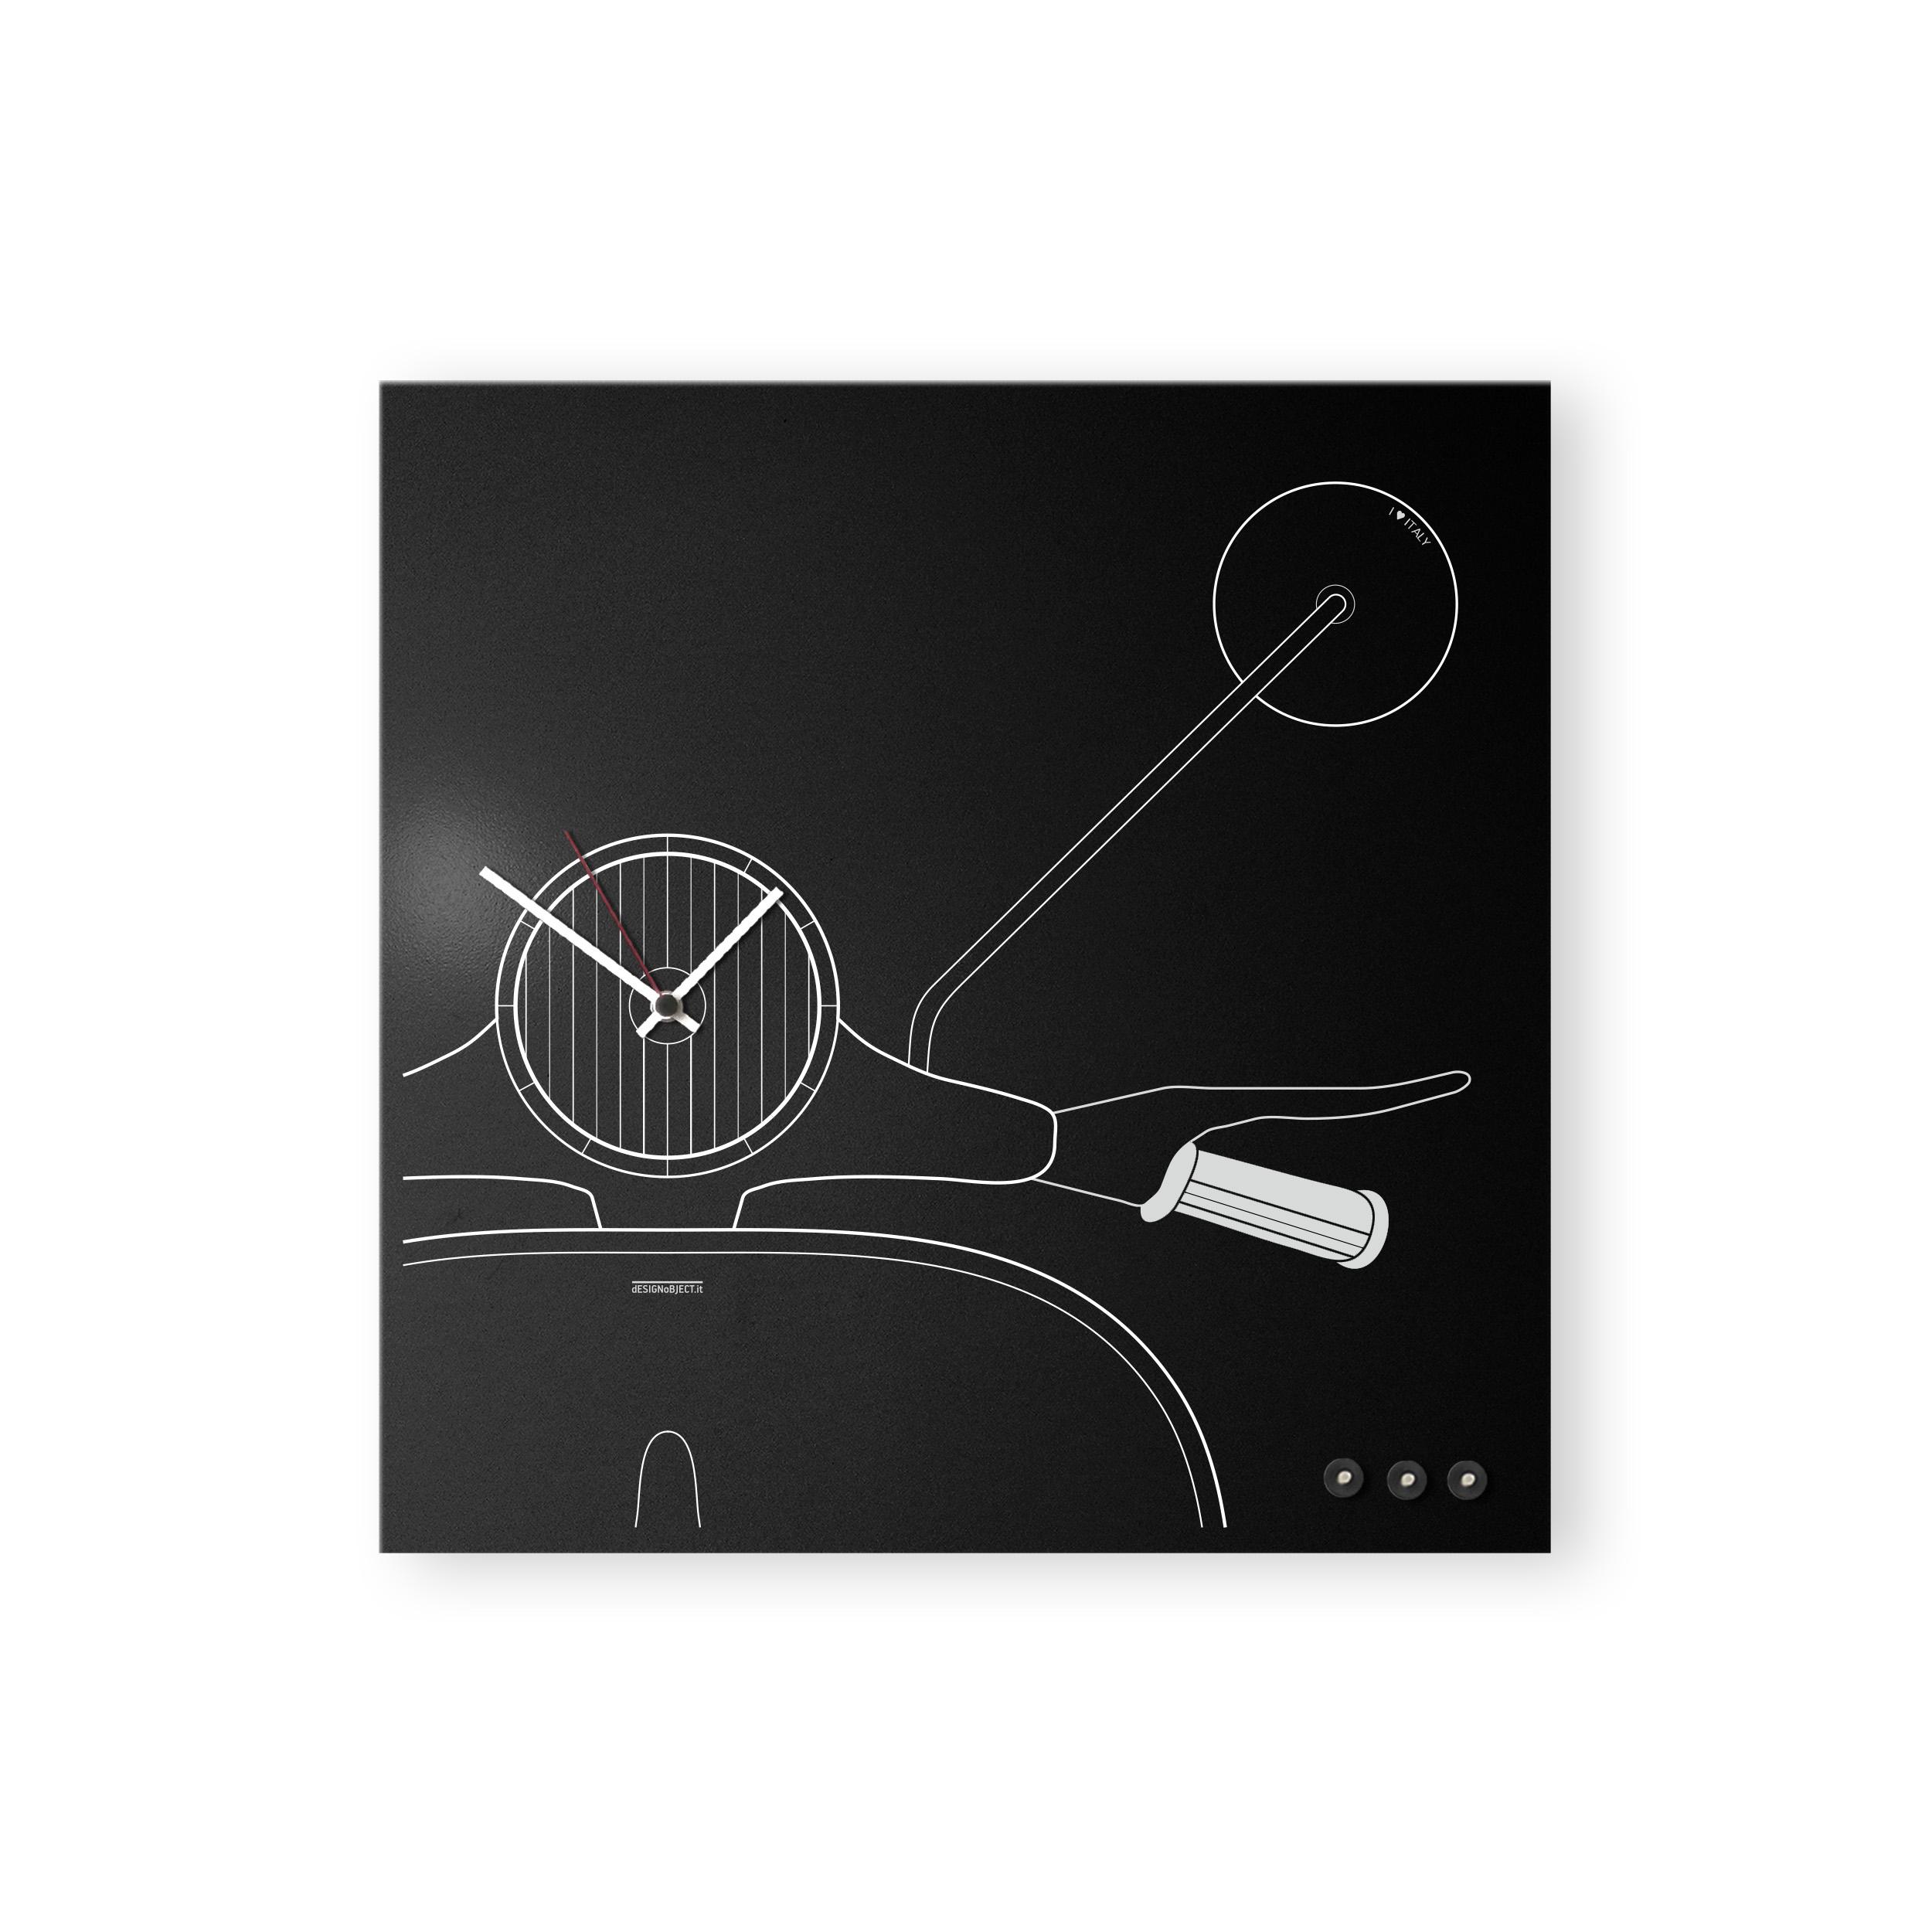 Vespa vintage clock black design